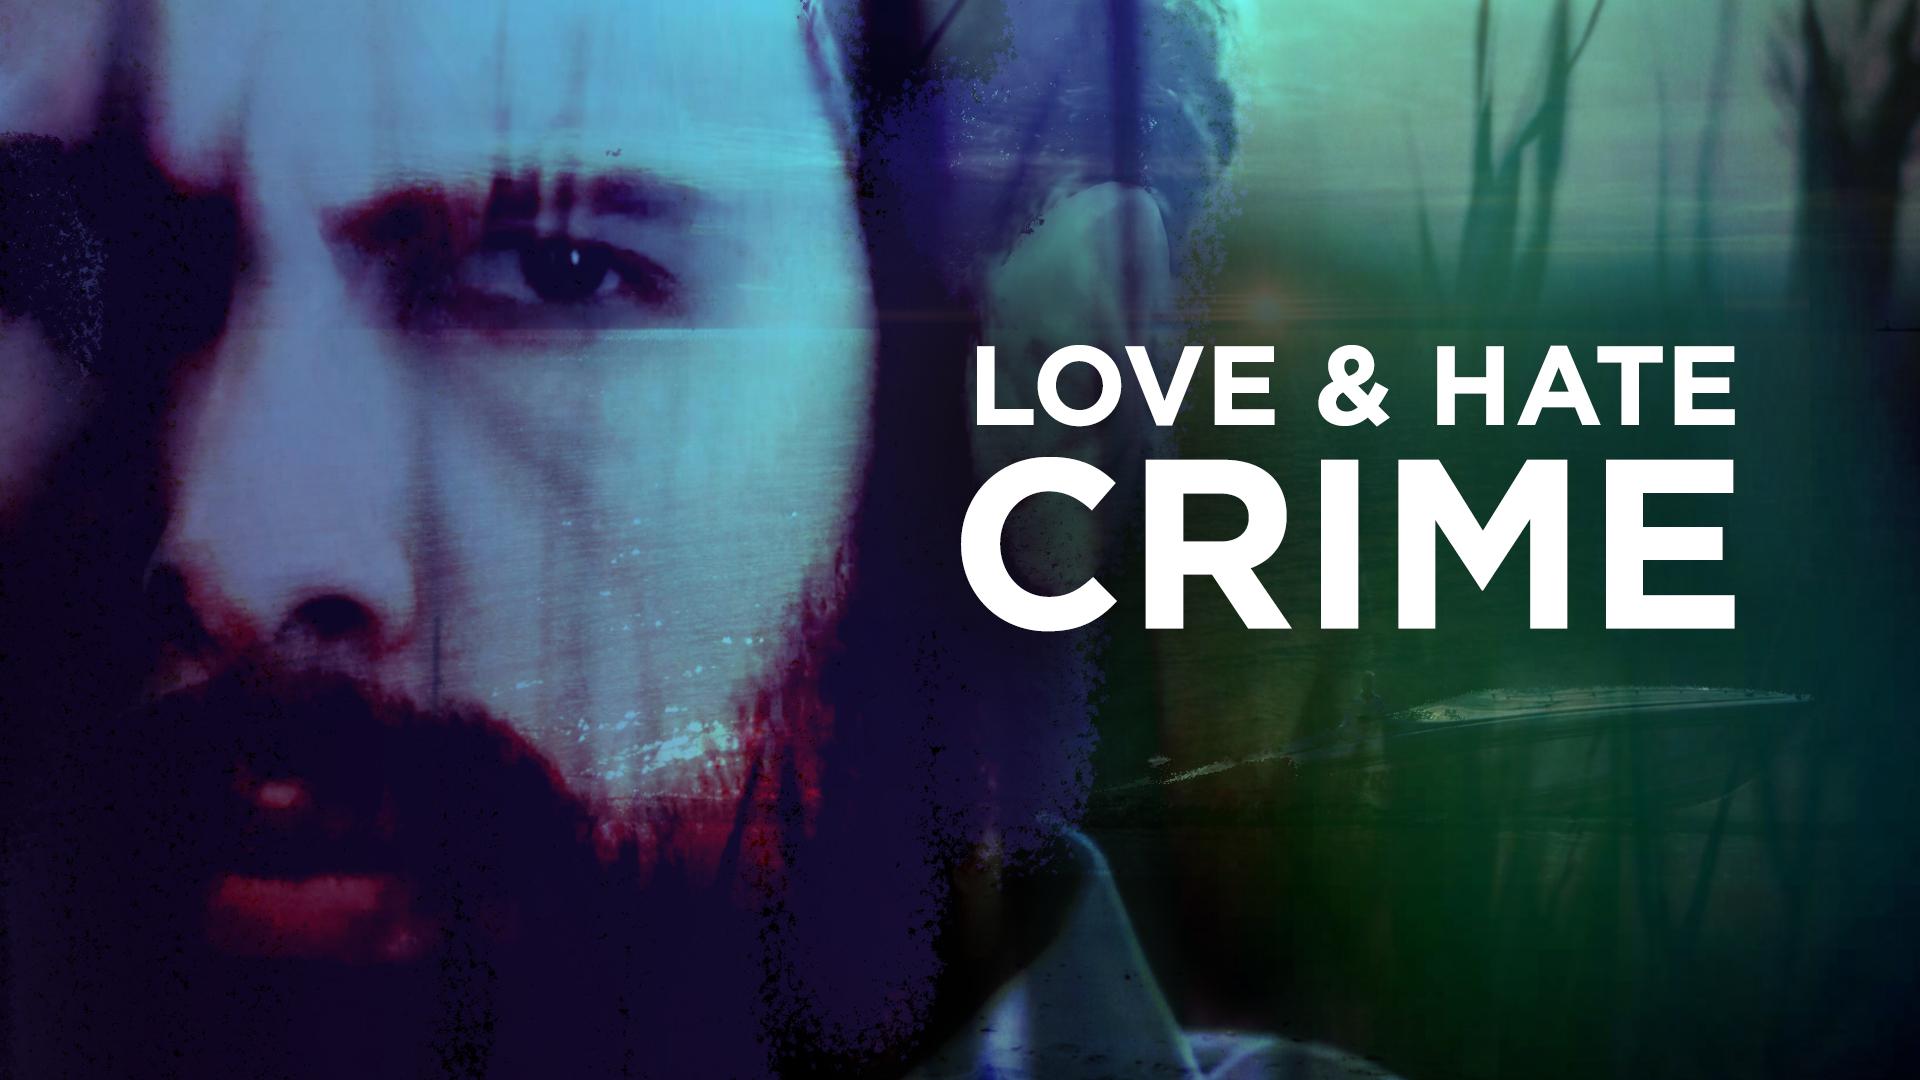 love-and-hate-crime_ep3_boxset.jpg